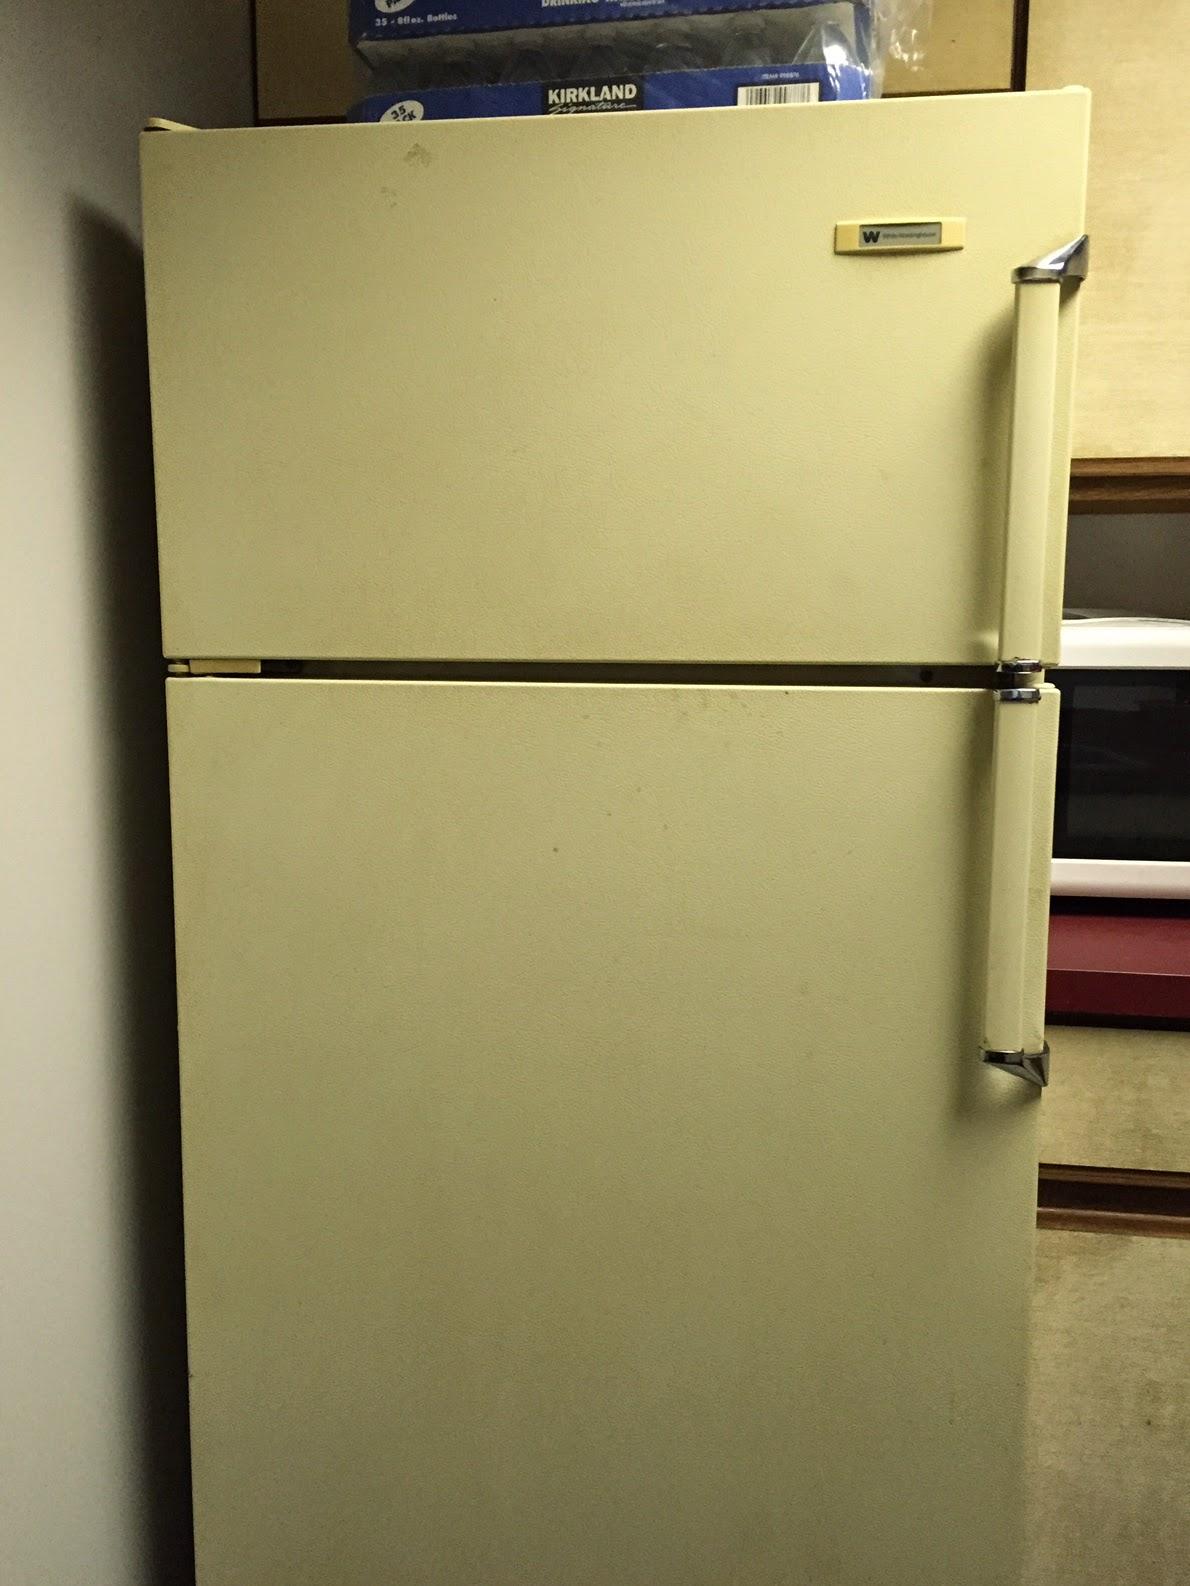 refrigerators, appliances, 801 N. John St, Goldsboro, NC, 27530, 919-731-5600